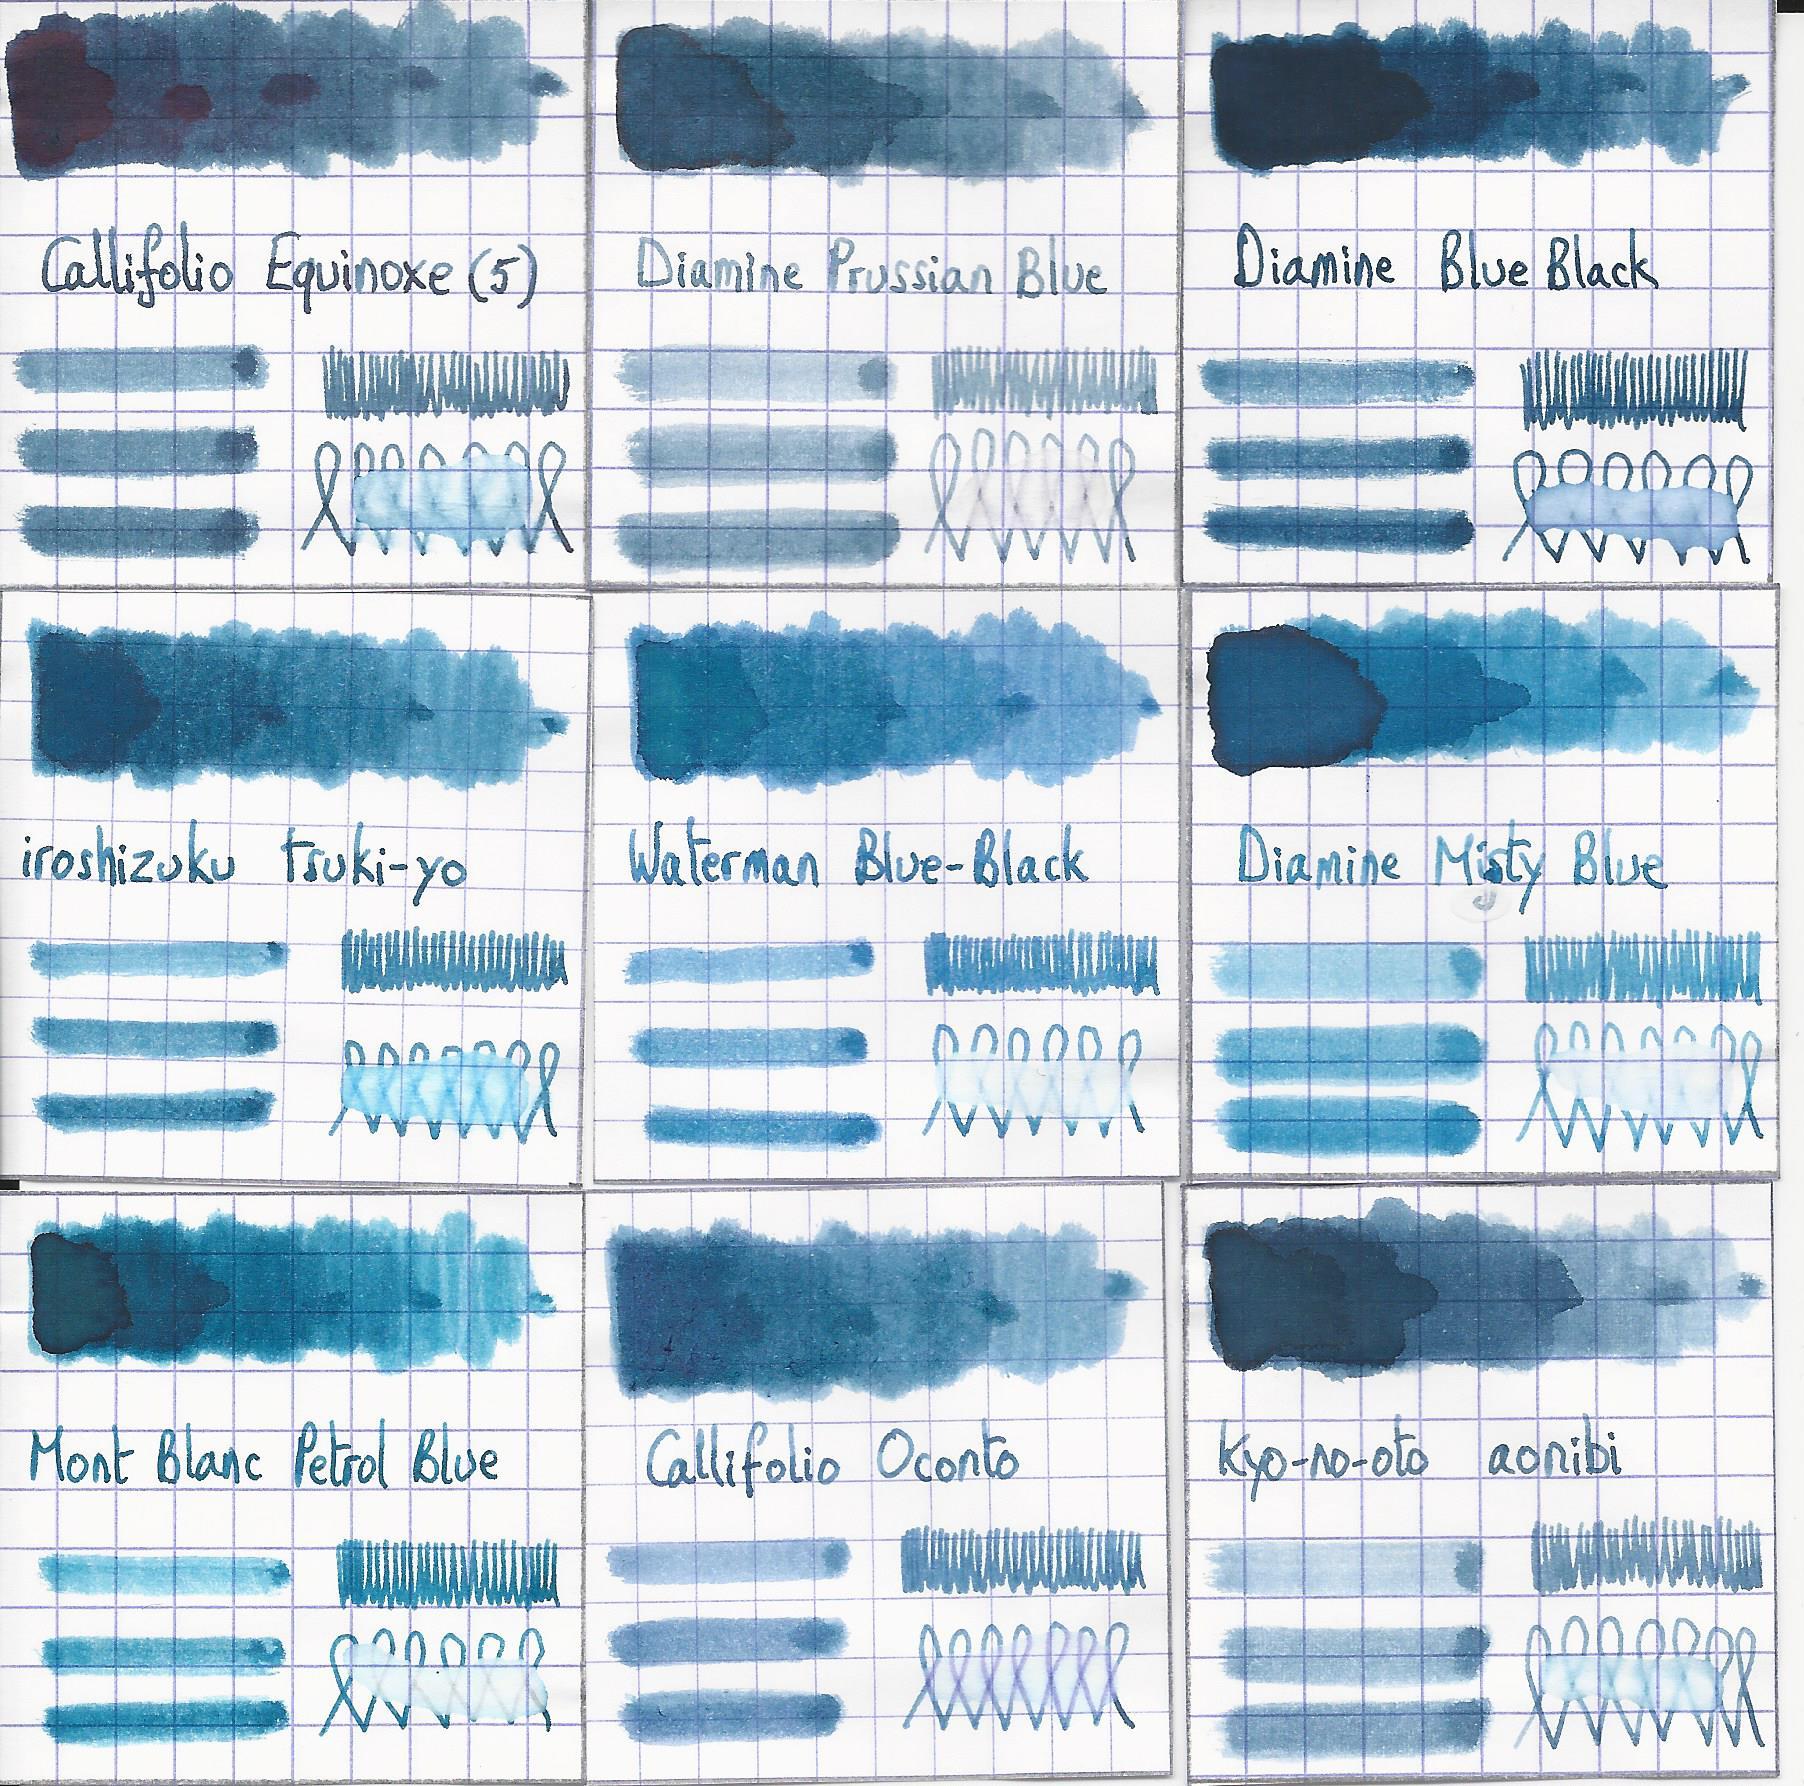 fpn_1600104029__waterman_-_blue_black_-_